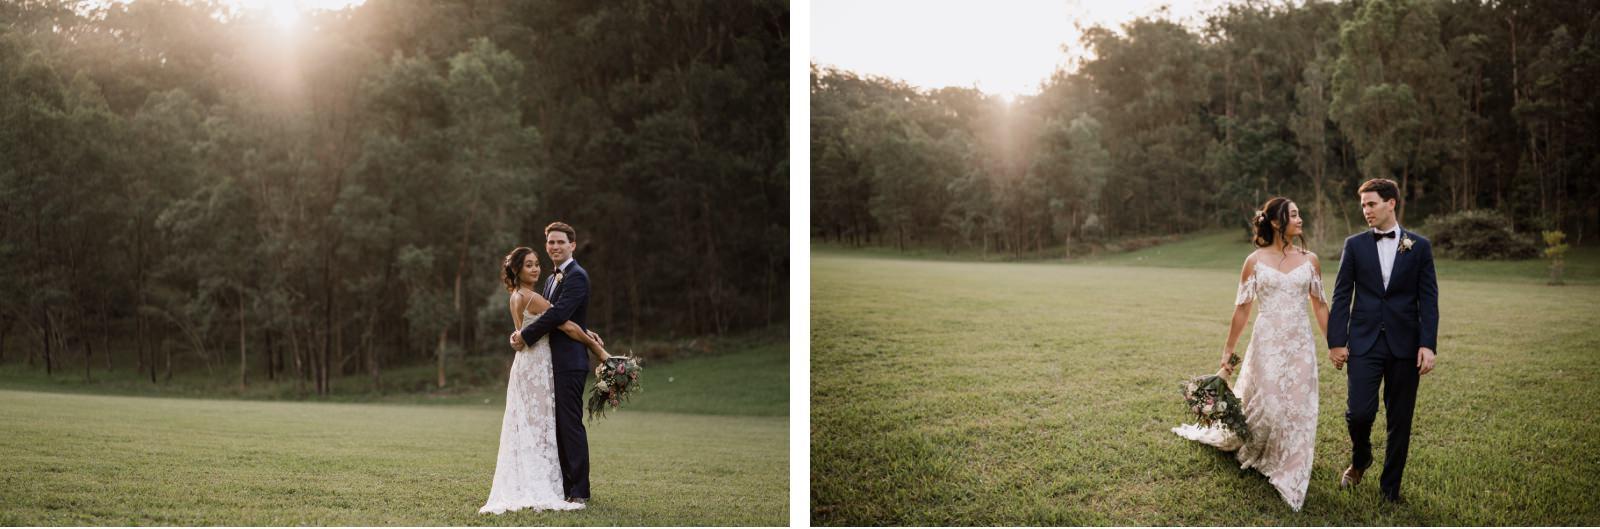 wollombi-wedding-photography-hunter-valley-wedding-photographers-62